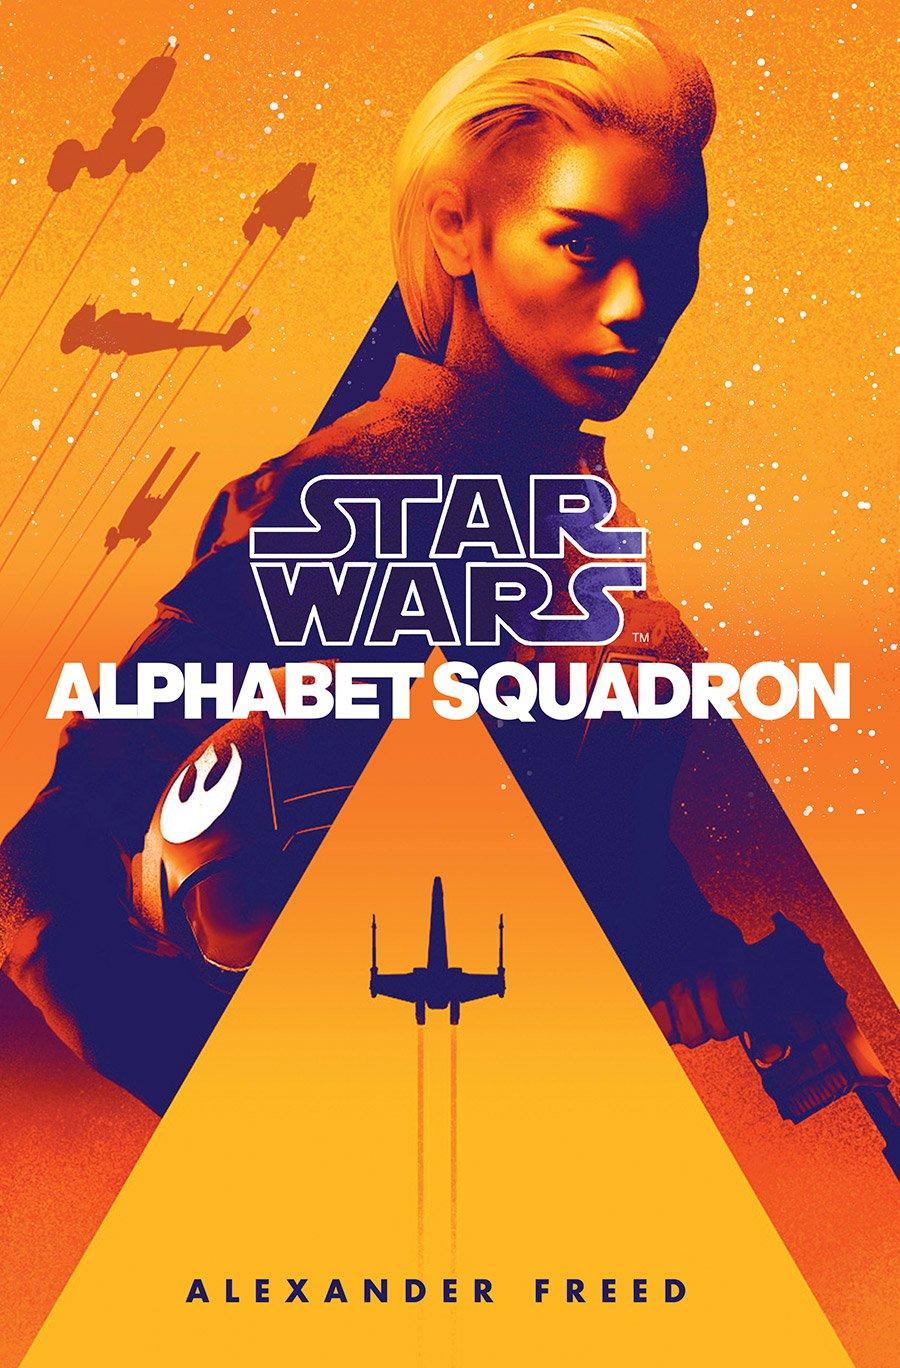 Star Wars Alphabet Squadron cover